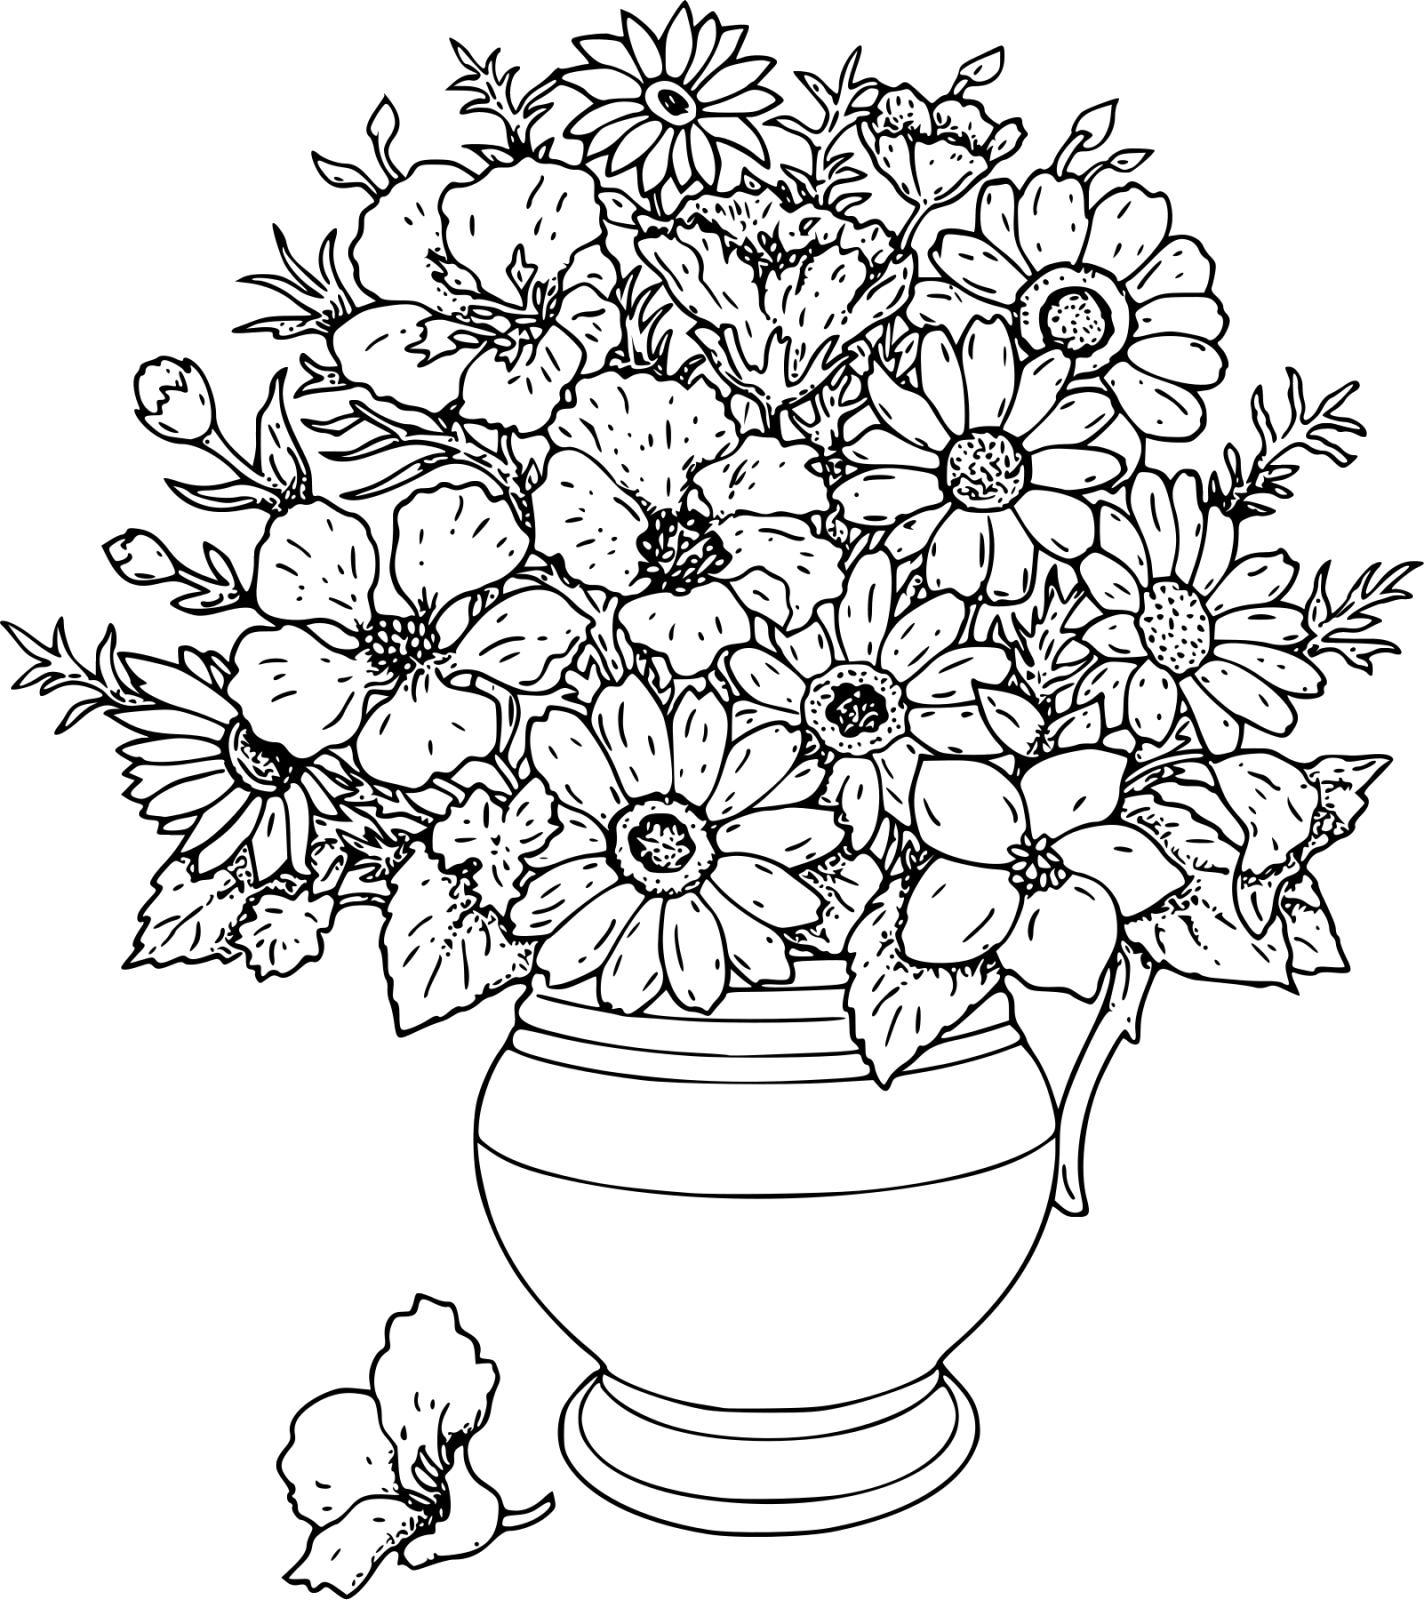 Swingshiftdesigns flowervase transparent 03 21 12g 14241600 explore flower line drawings flower vase drawing and more reviewsmspy